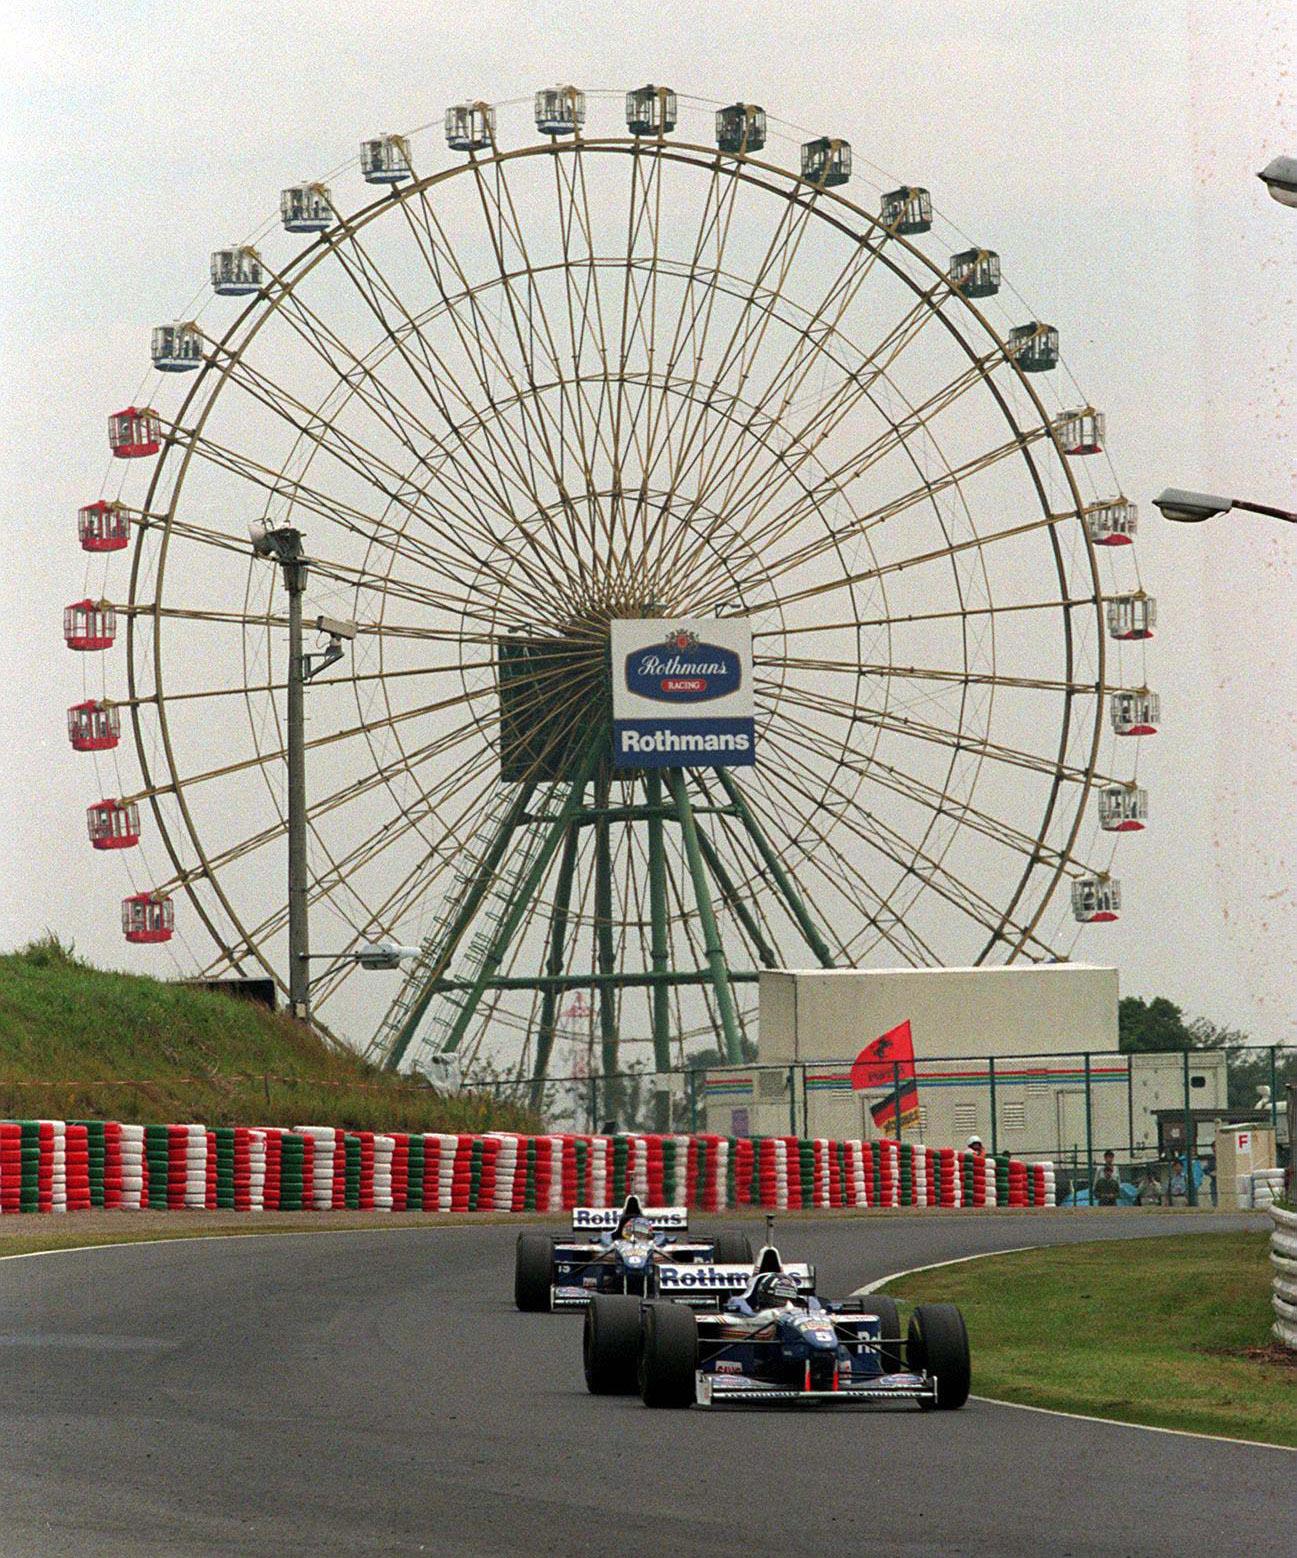 Damon-hill-ahead-of-Jacques-Villeneuve-in-front-of-Suzuka-ferris-wheel